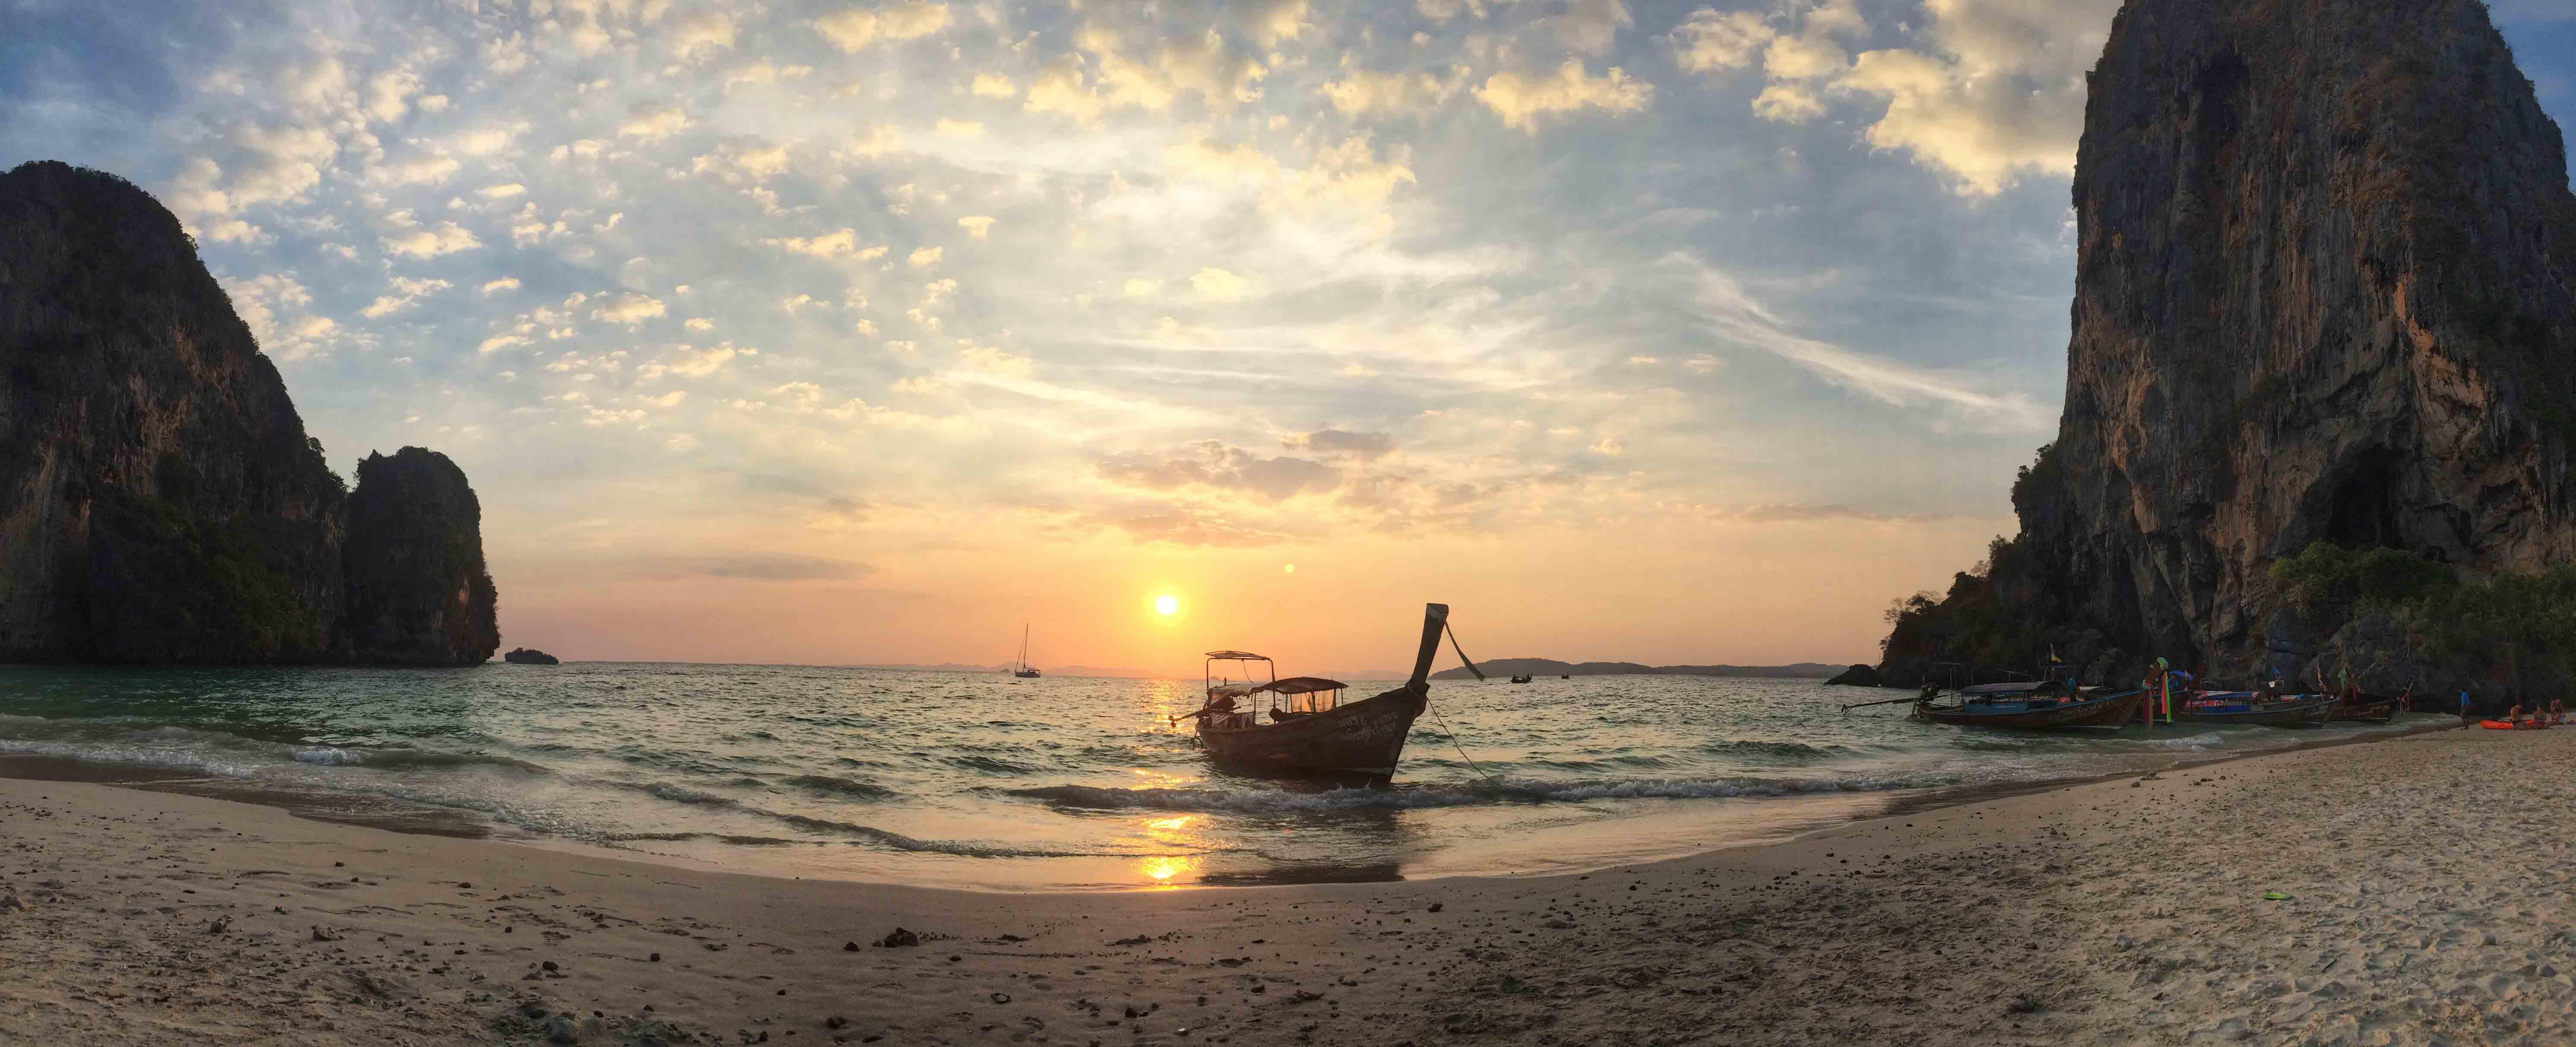 dicas de krabi - tailândia - phranang cave beach